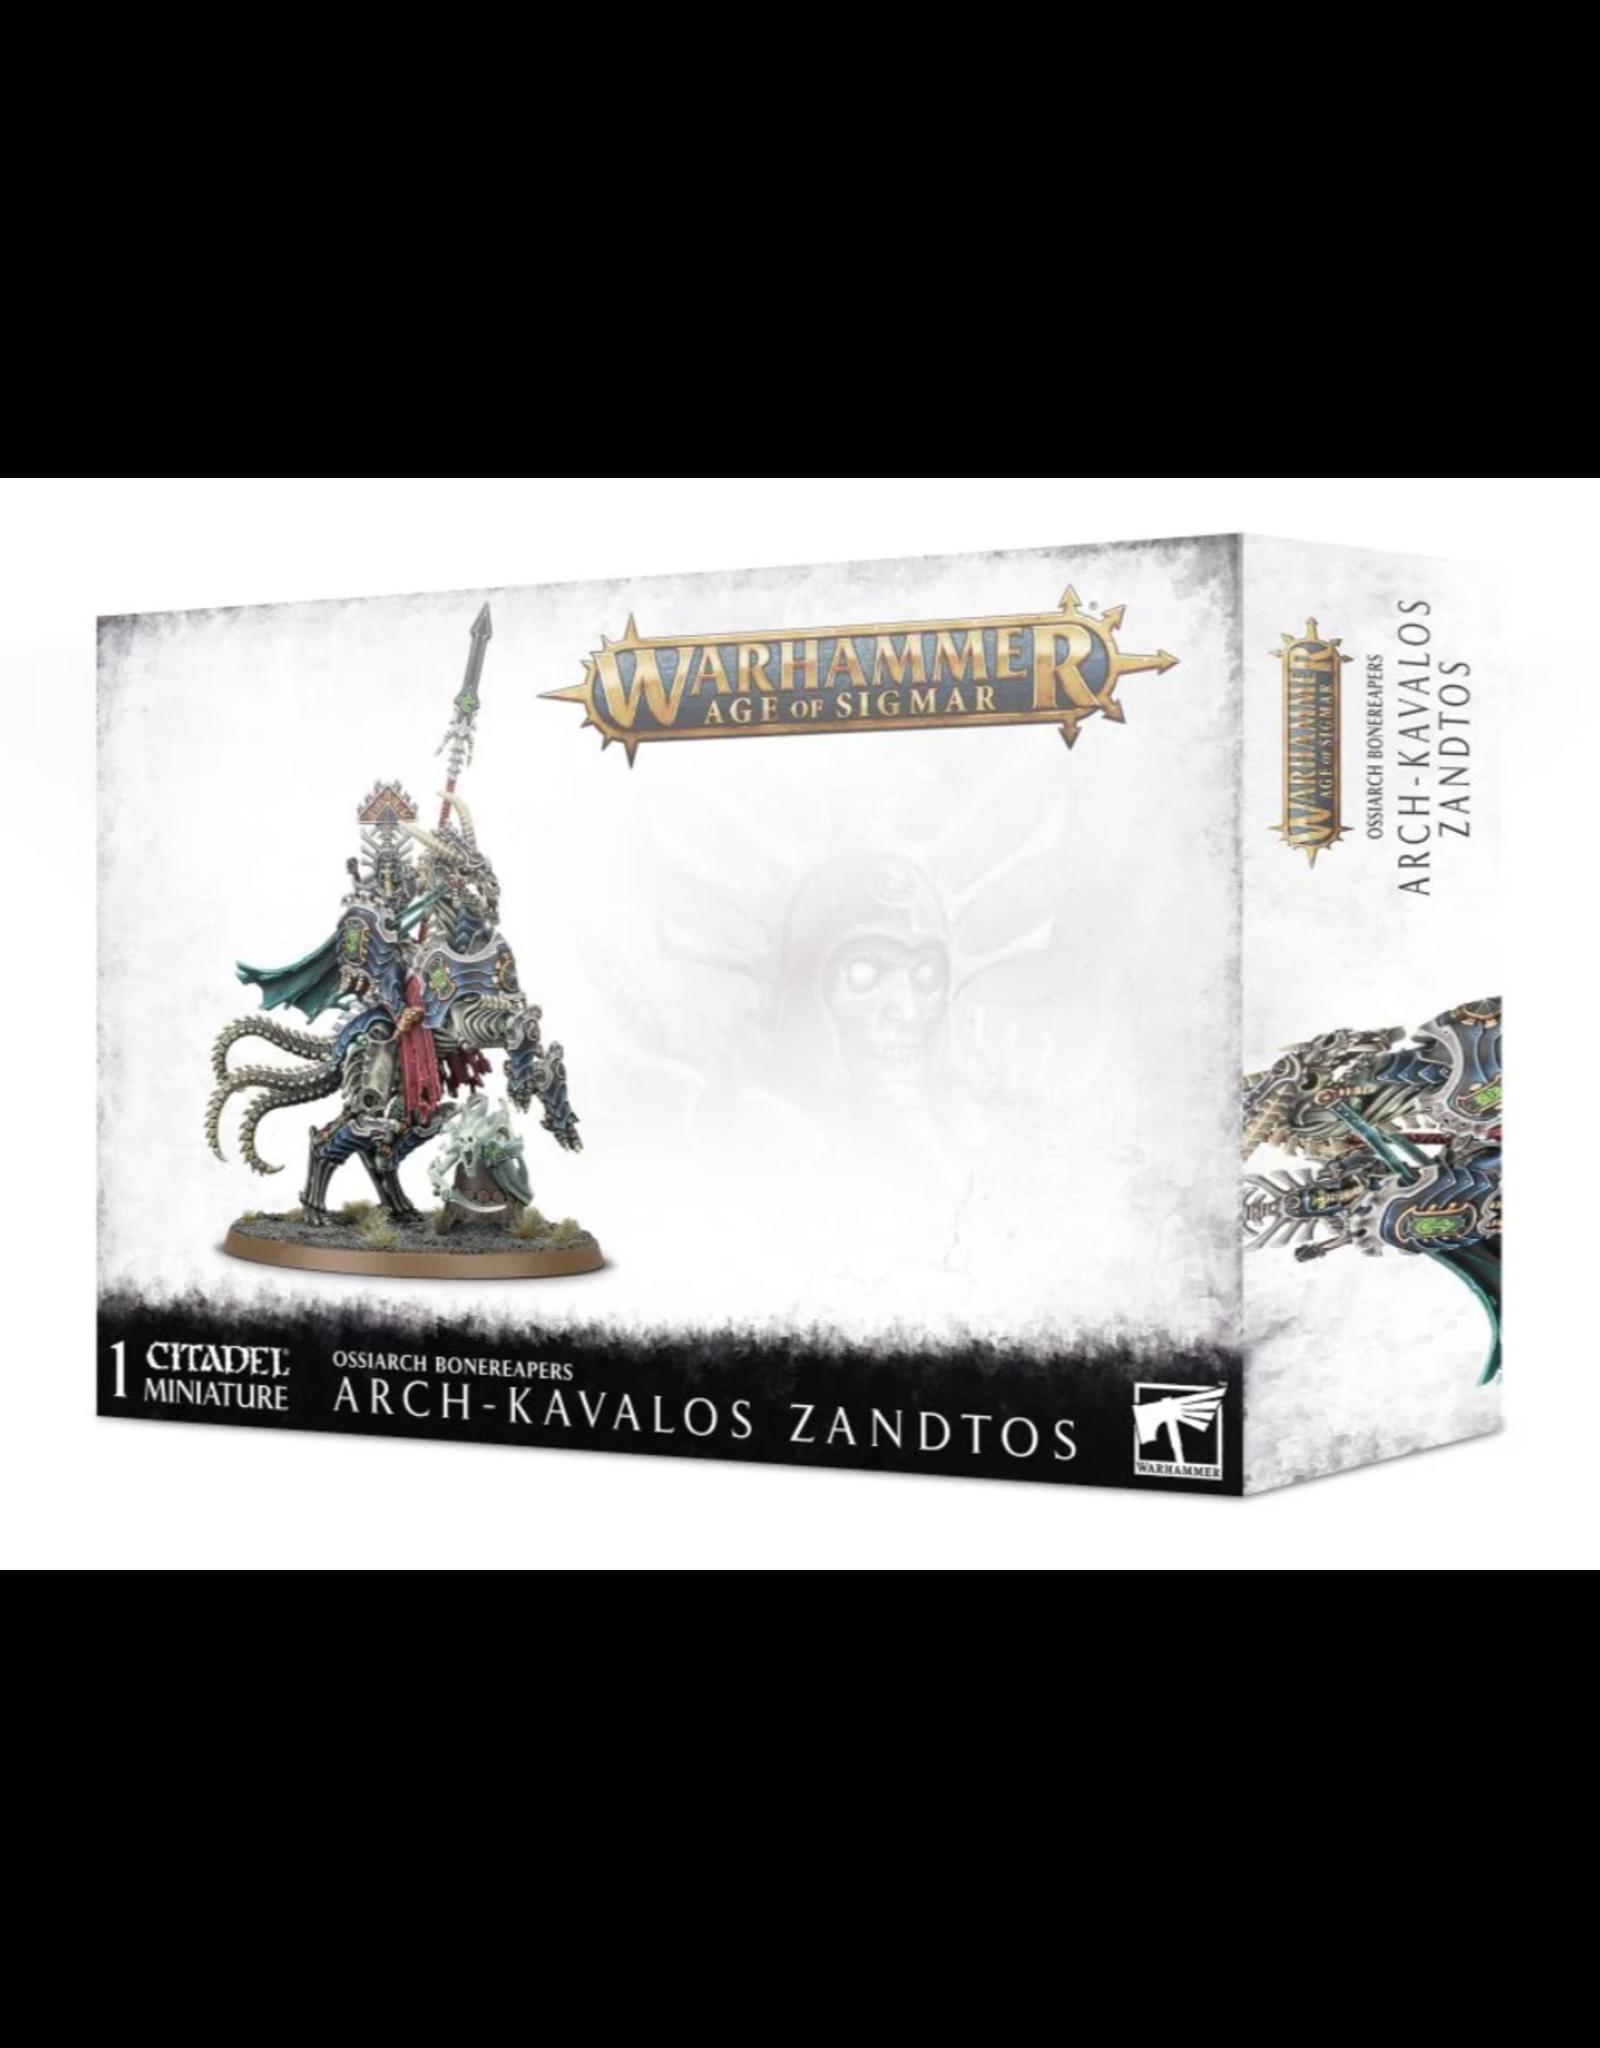 Age of Sigmar Arch-Kavalos Zandtos Dark Lance of